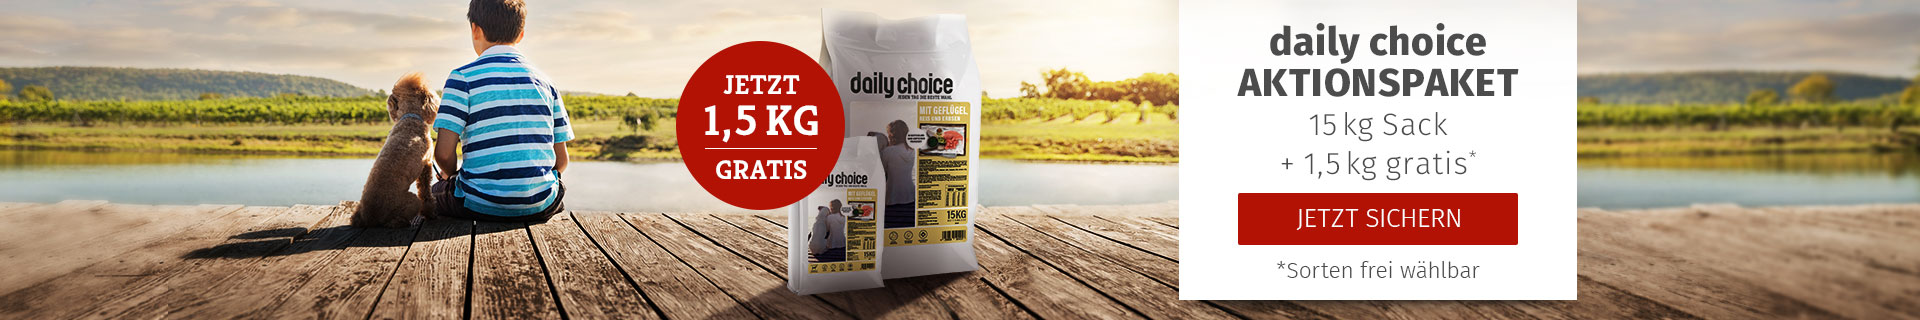 daily coice Trockenfutter Aktionspaket - 15kg + 1,5kg gratis